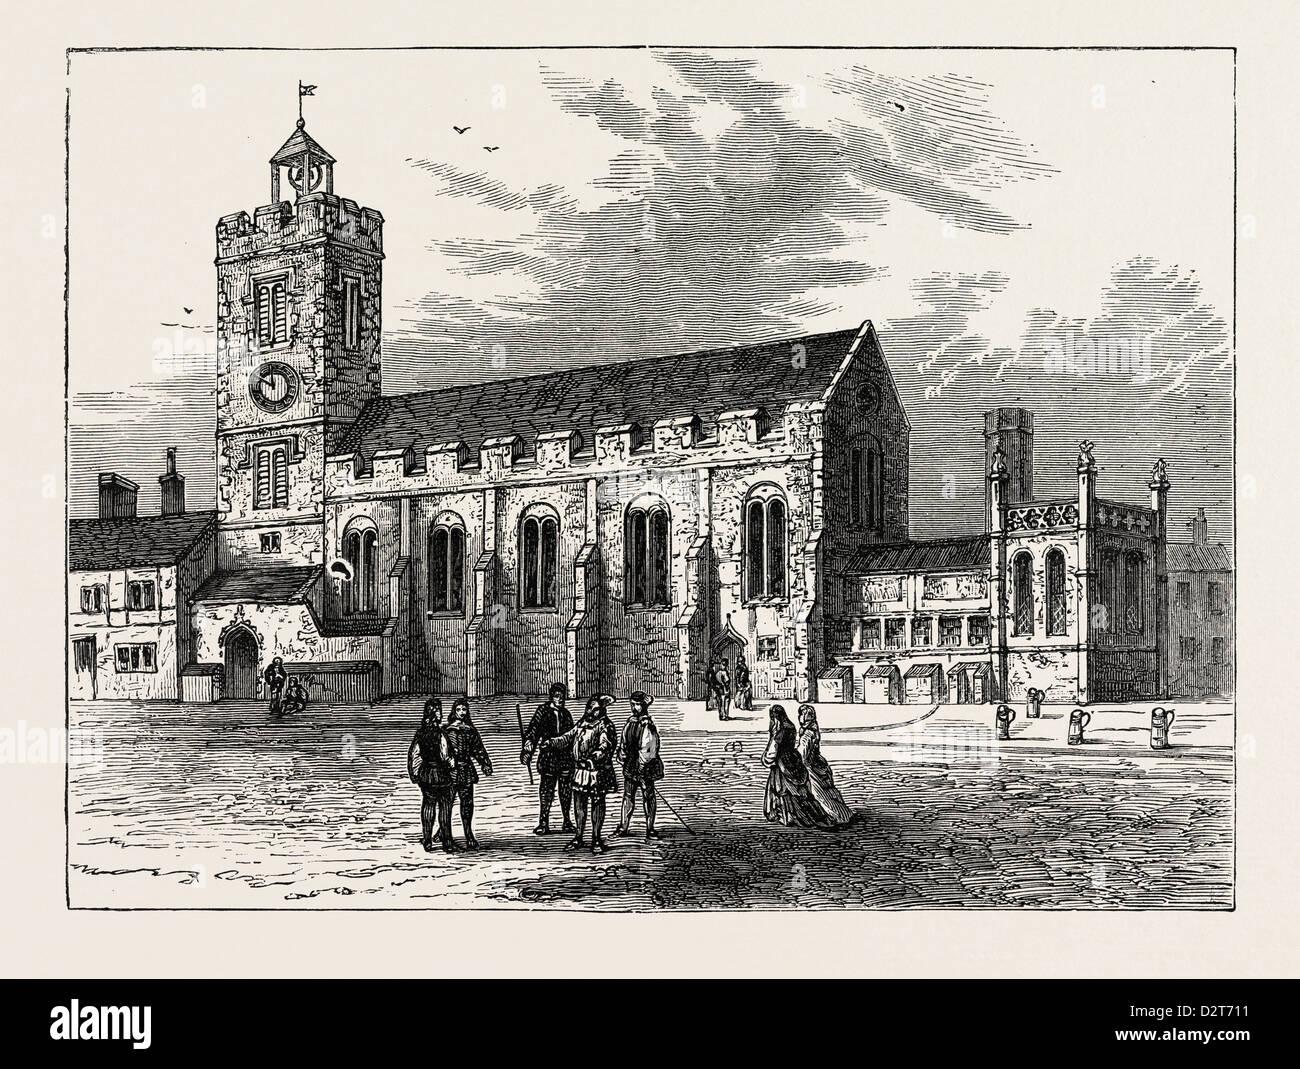 THE CHURCH OF ST. MICHAEL AD BLADUM A.D. 1585 LONDON - Stock Image